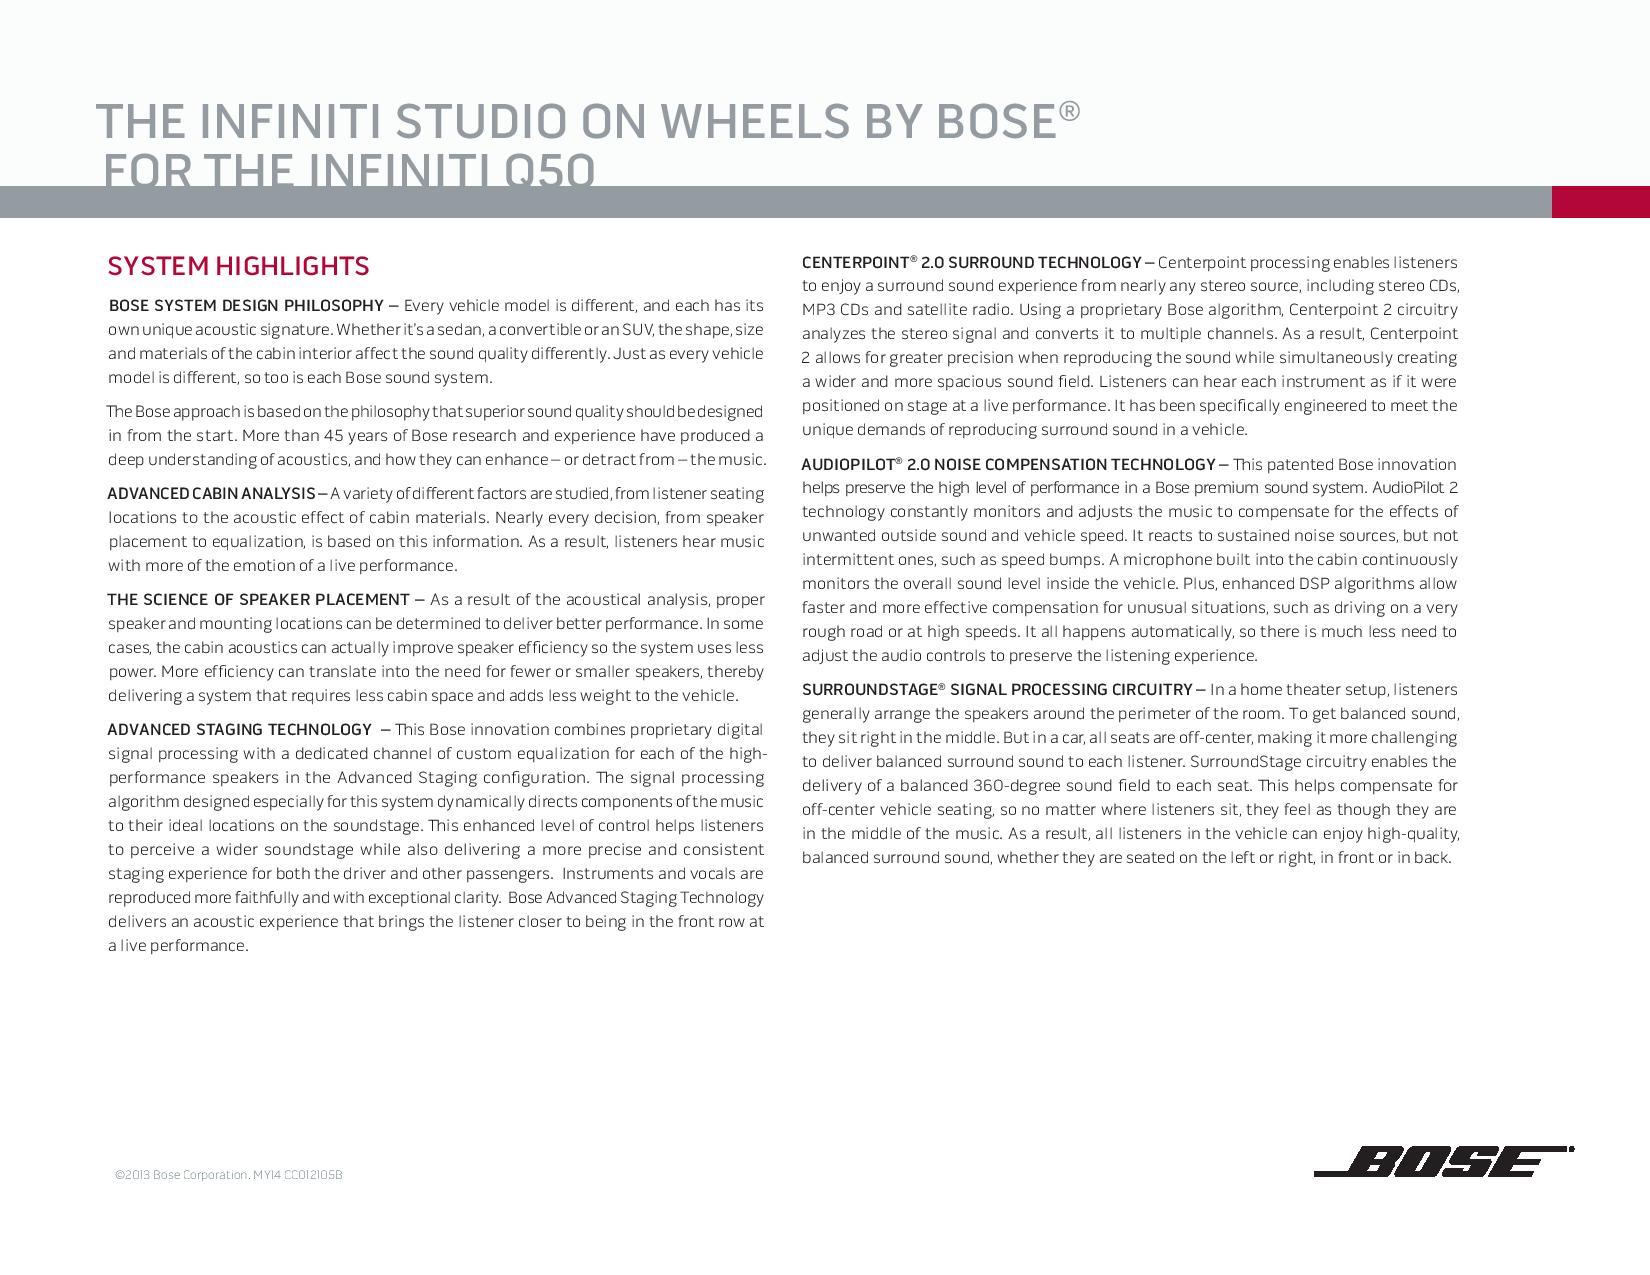 2013 infiniti g37 bose sound system specs